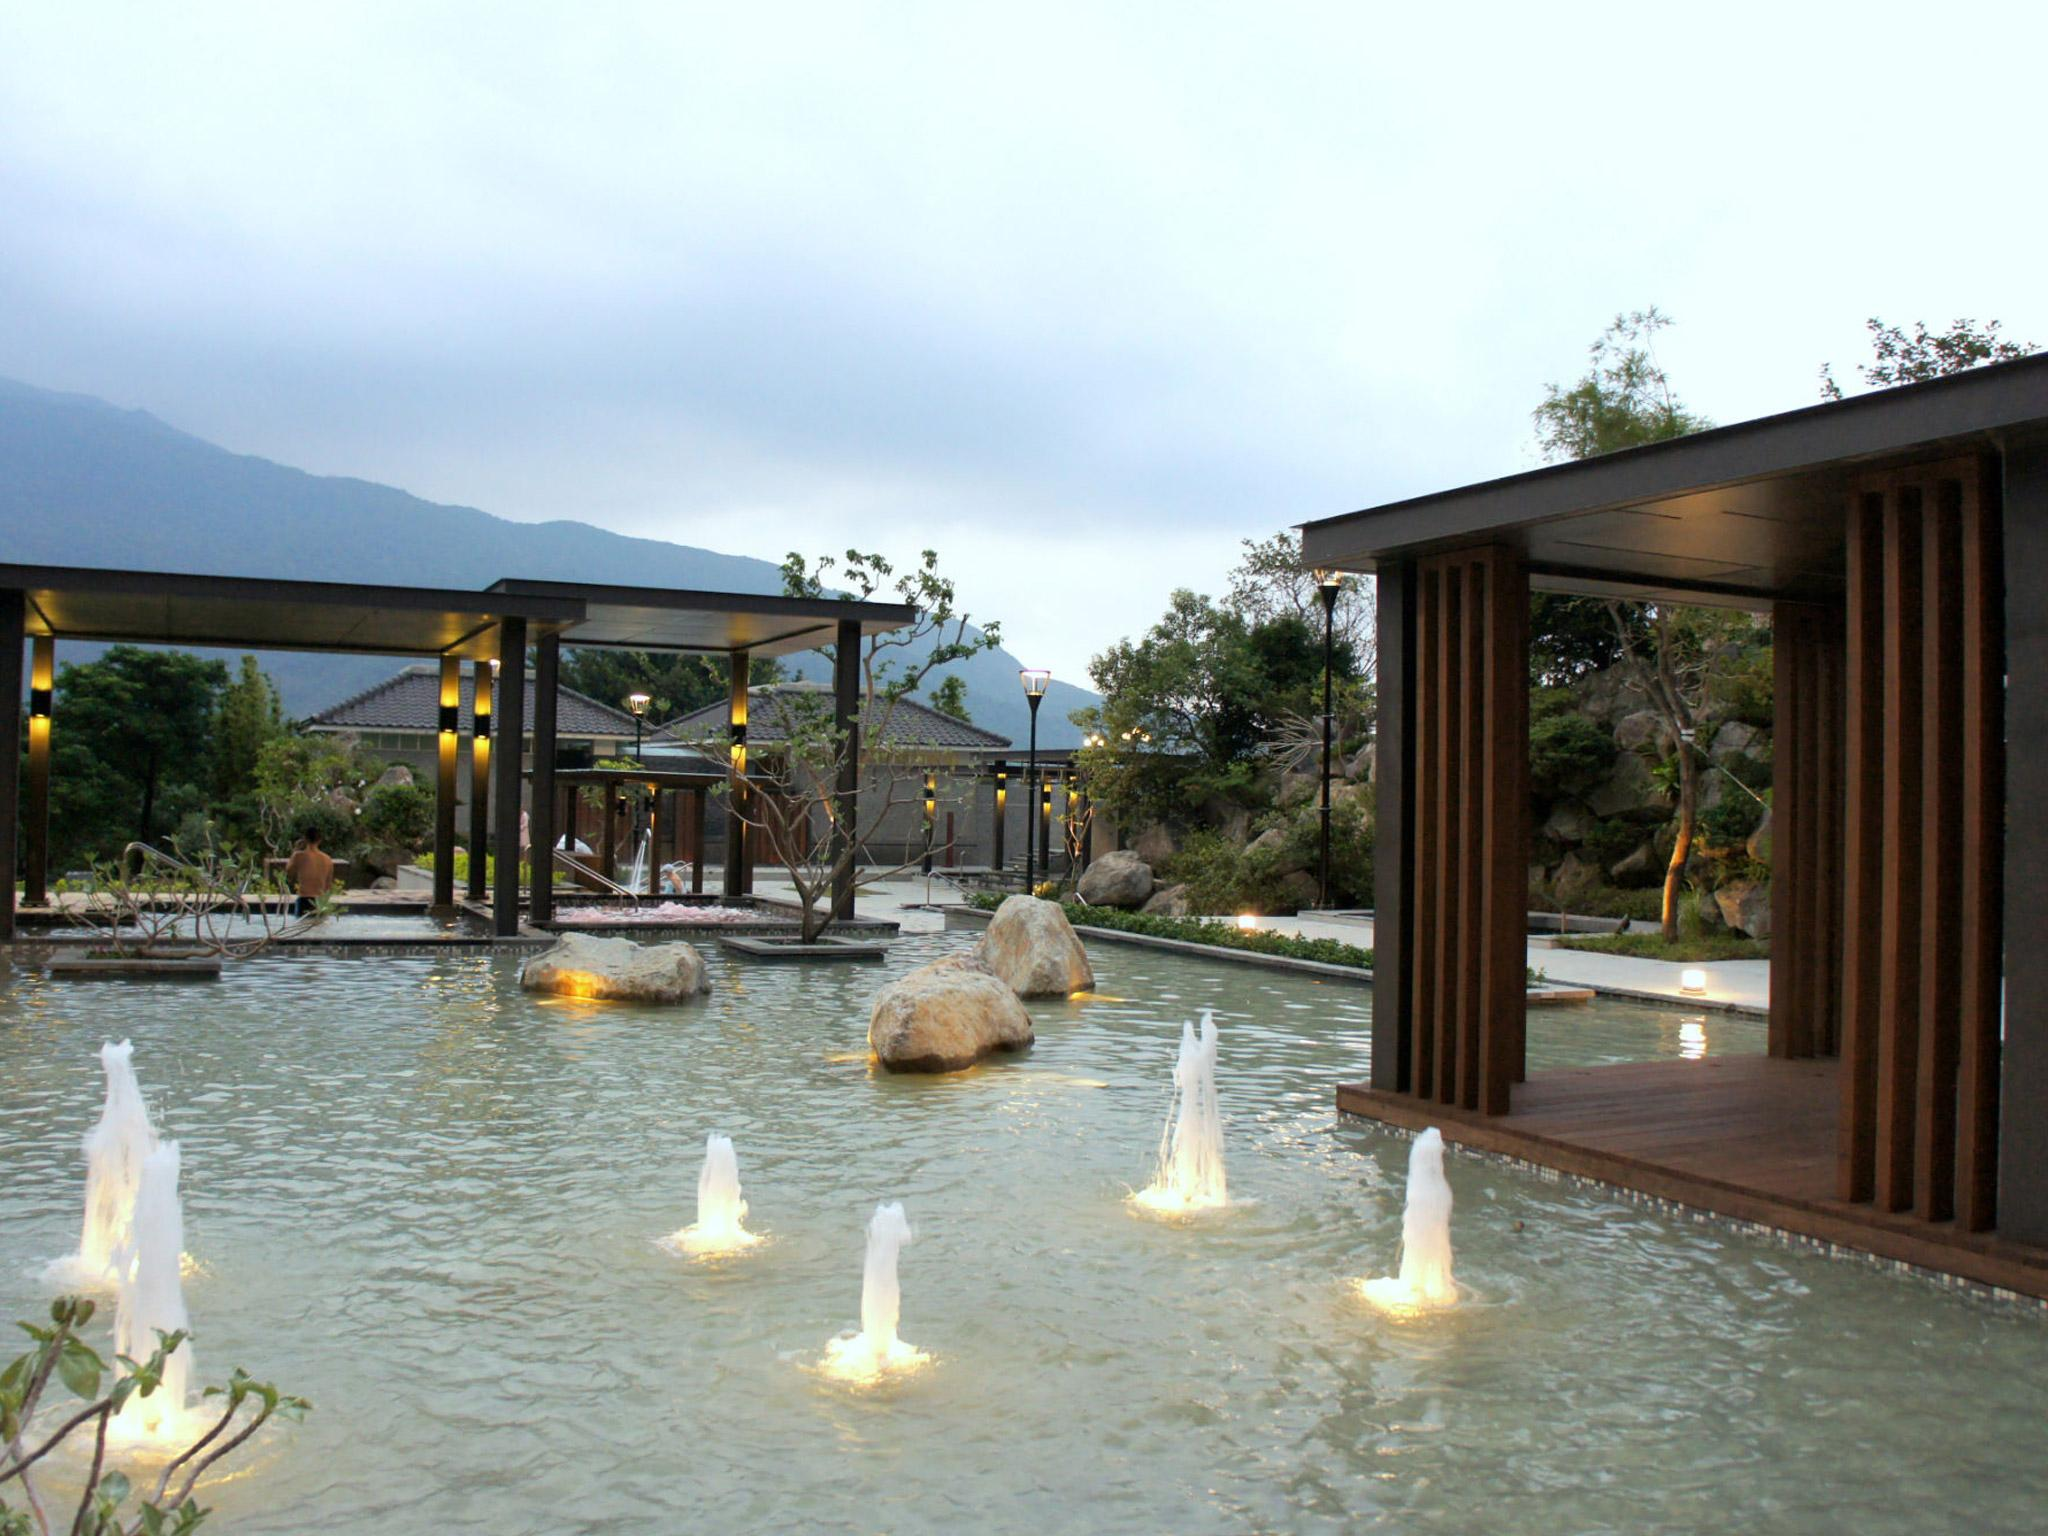 阳明山天籁度假酒店 (yang ming shan tien lai resort & spa)